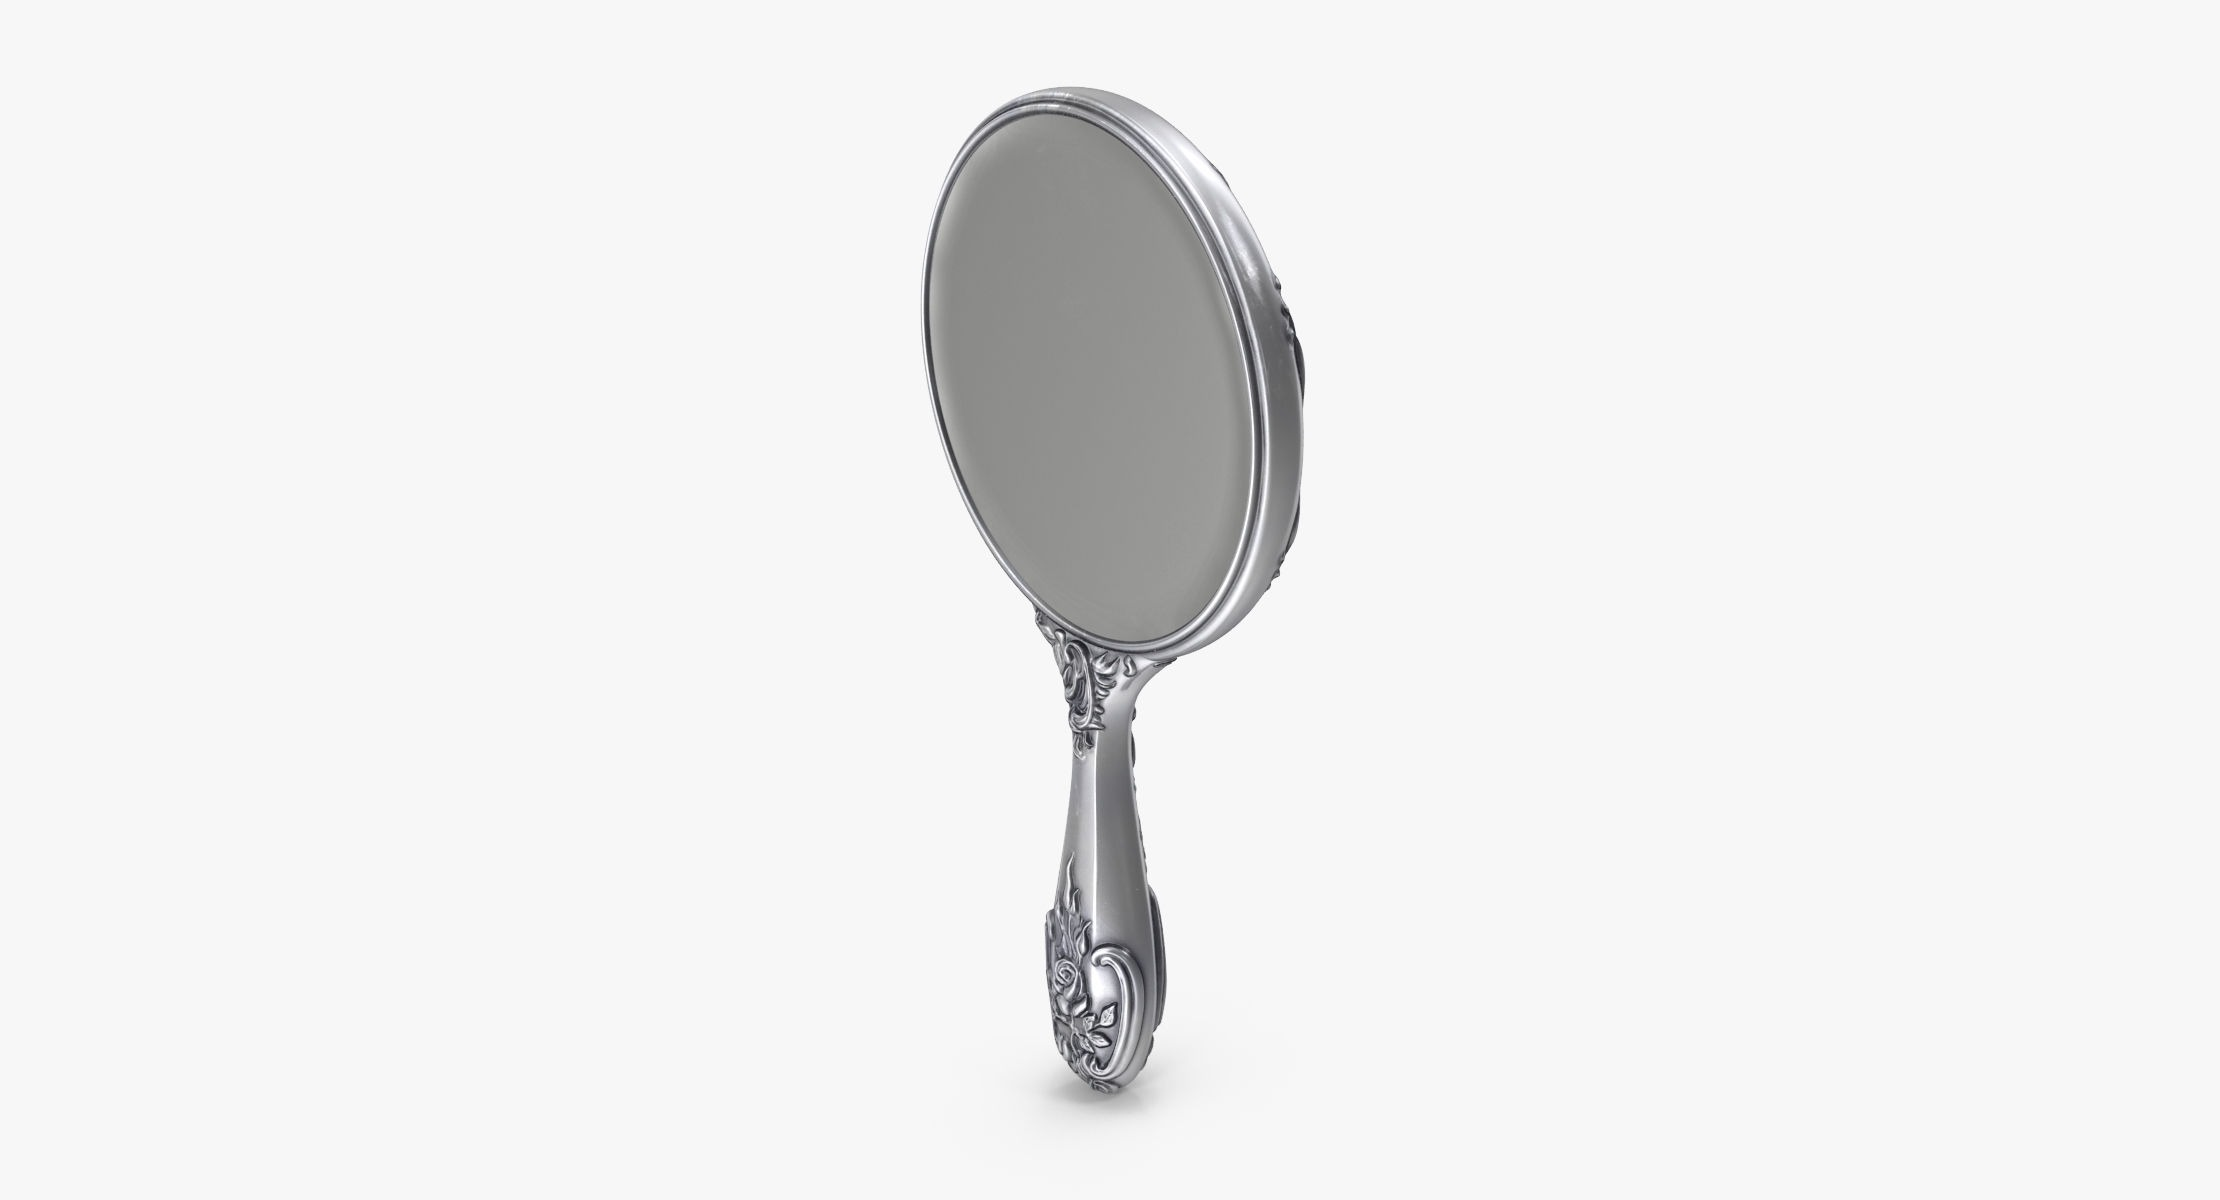 Hand Mirror 02 - reel 1